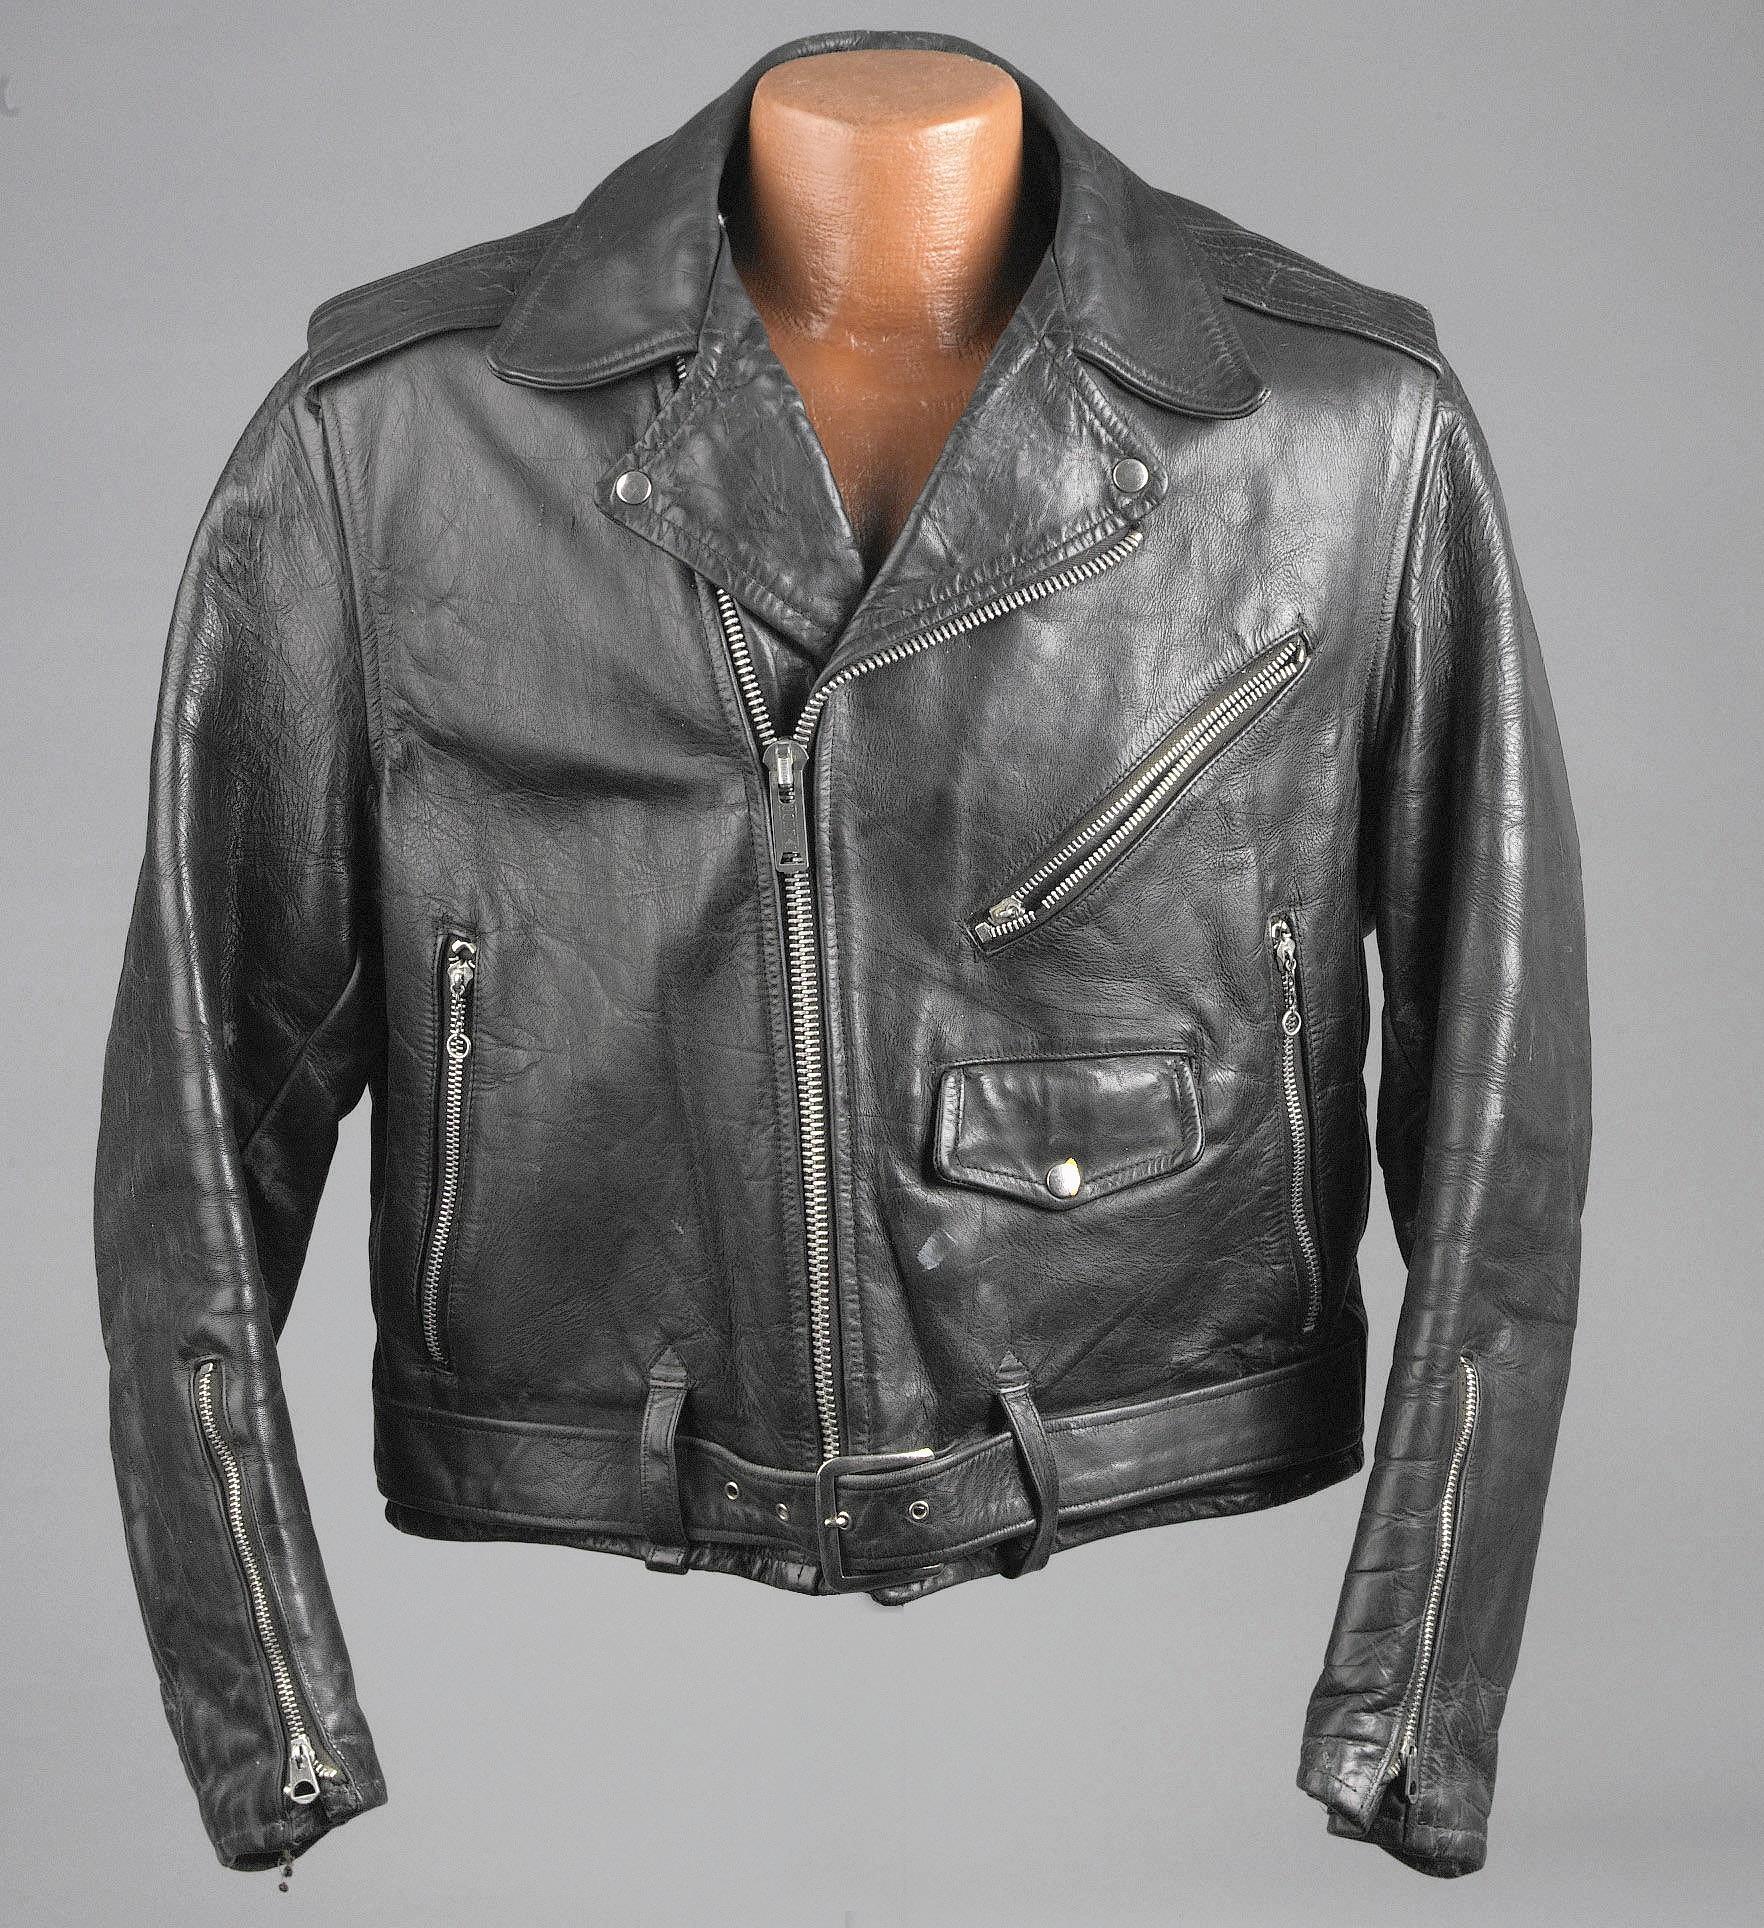 dda350dea Worn to be wild explores cultural legacy of the motorcycle jacket ...